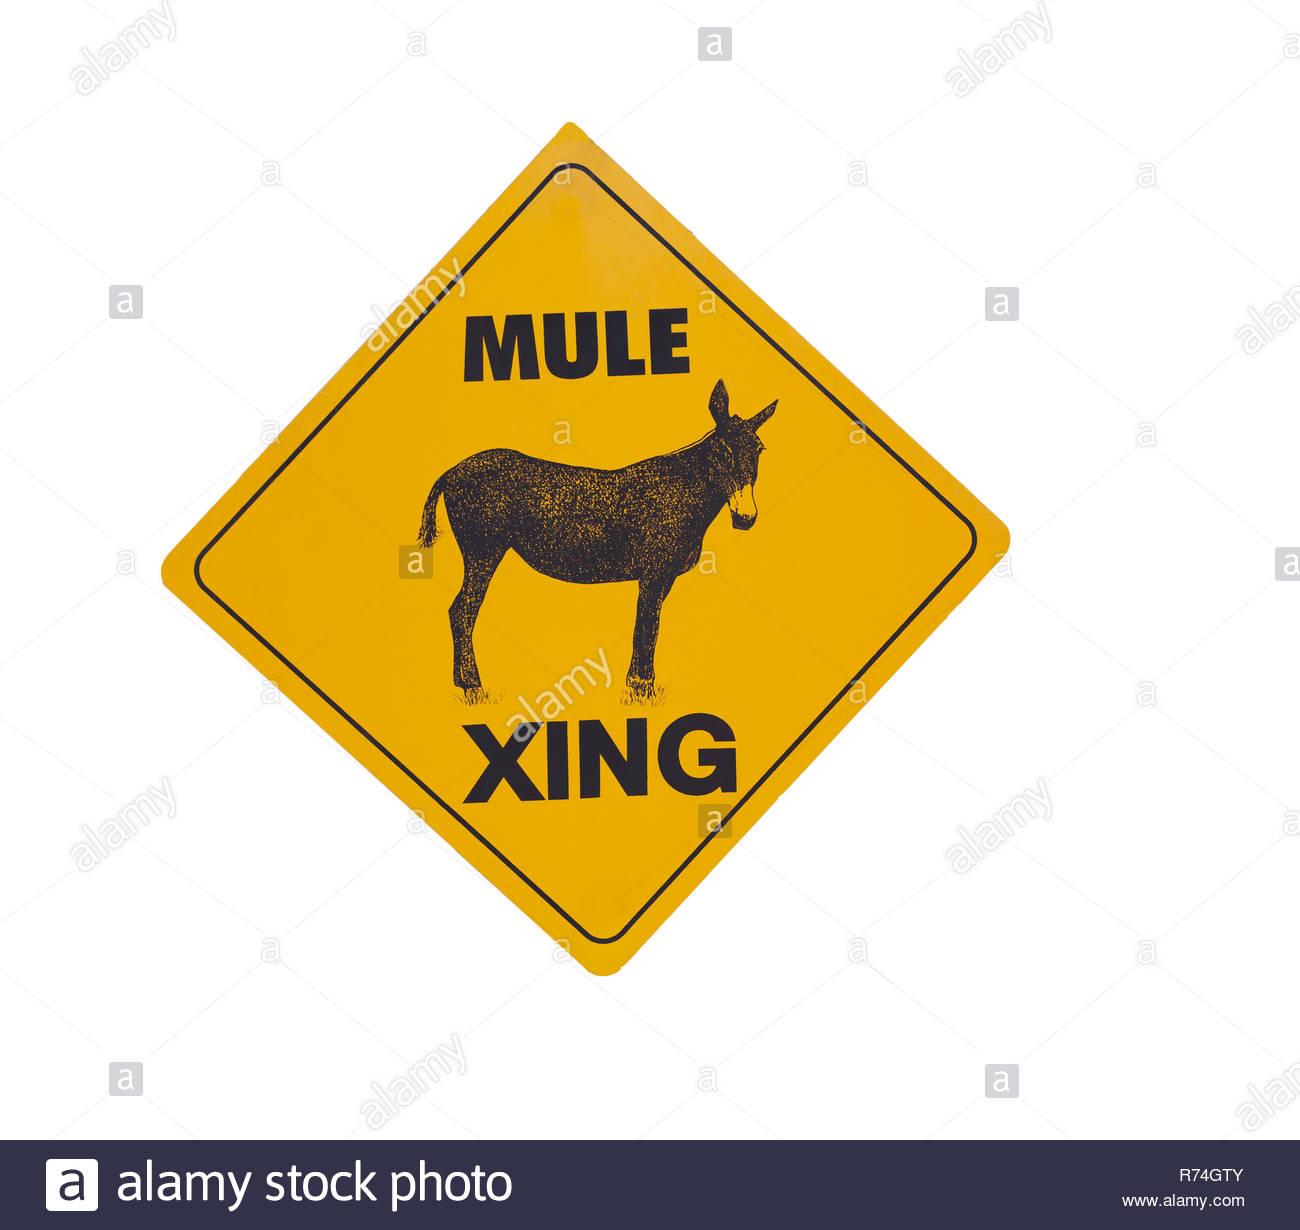 mule crossing road sign - Stock Image